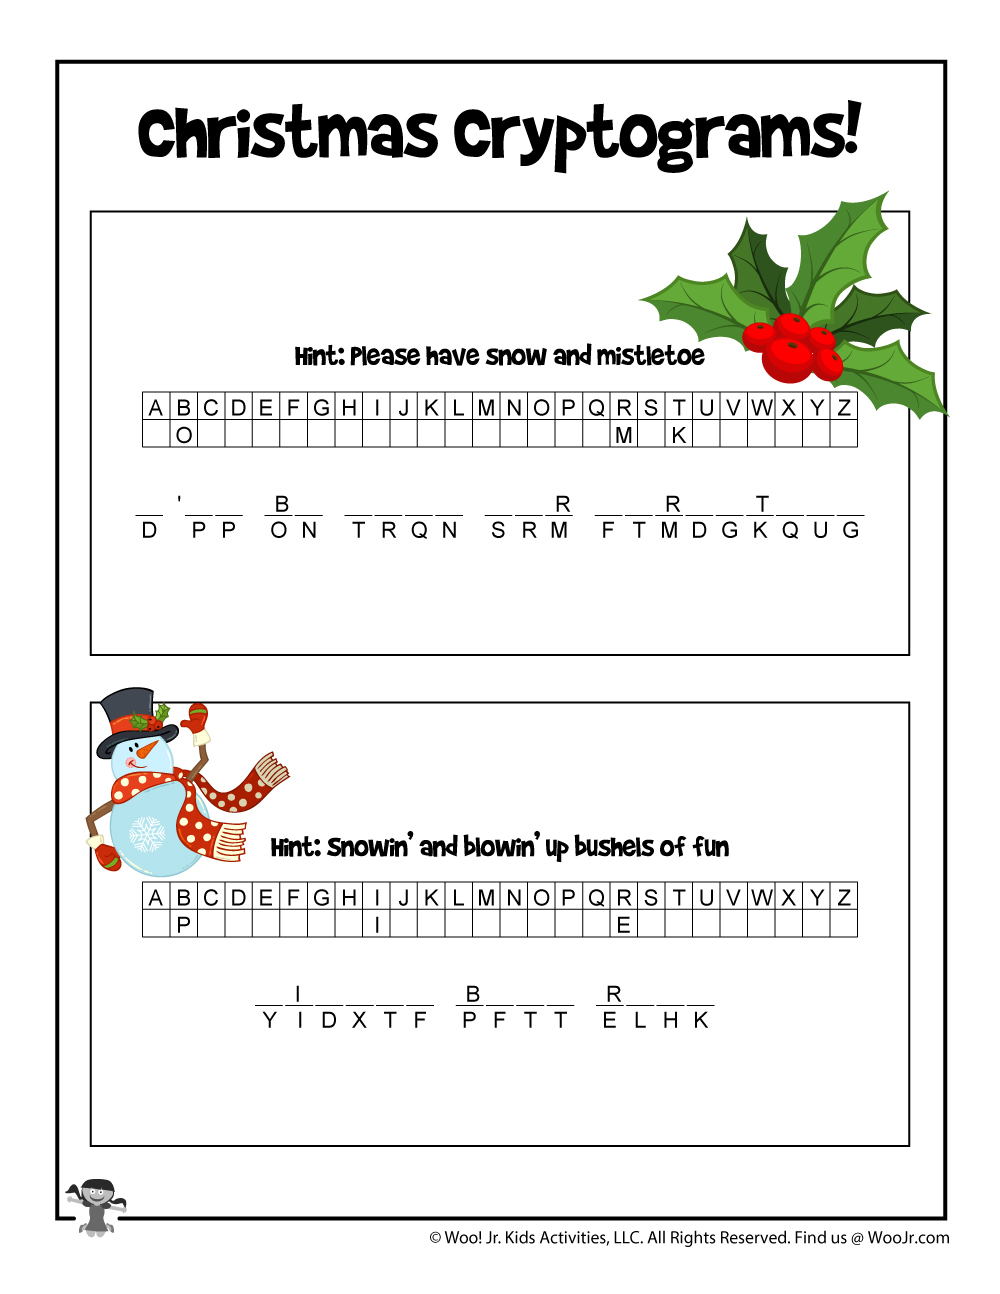 Christmas Carols Printable Puzzle Game | Woo! Jr. Kids